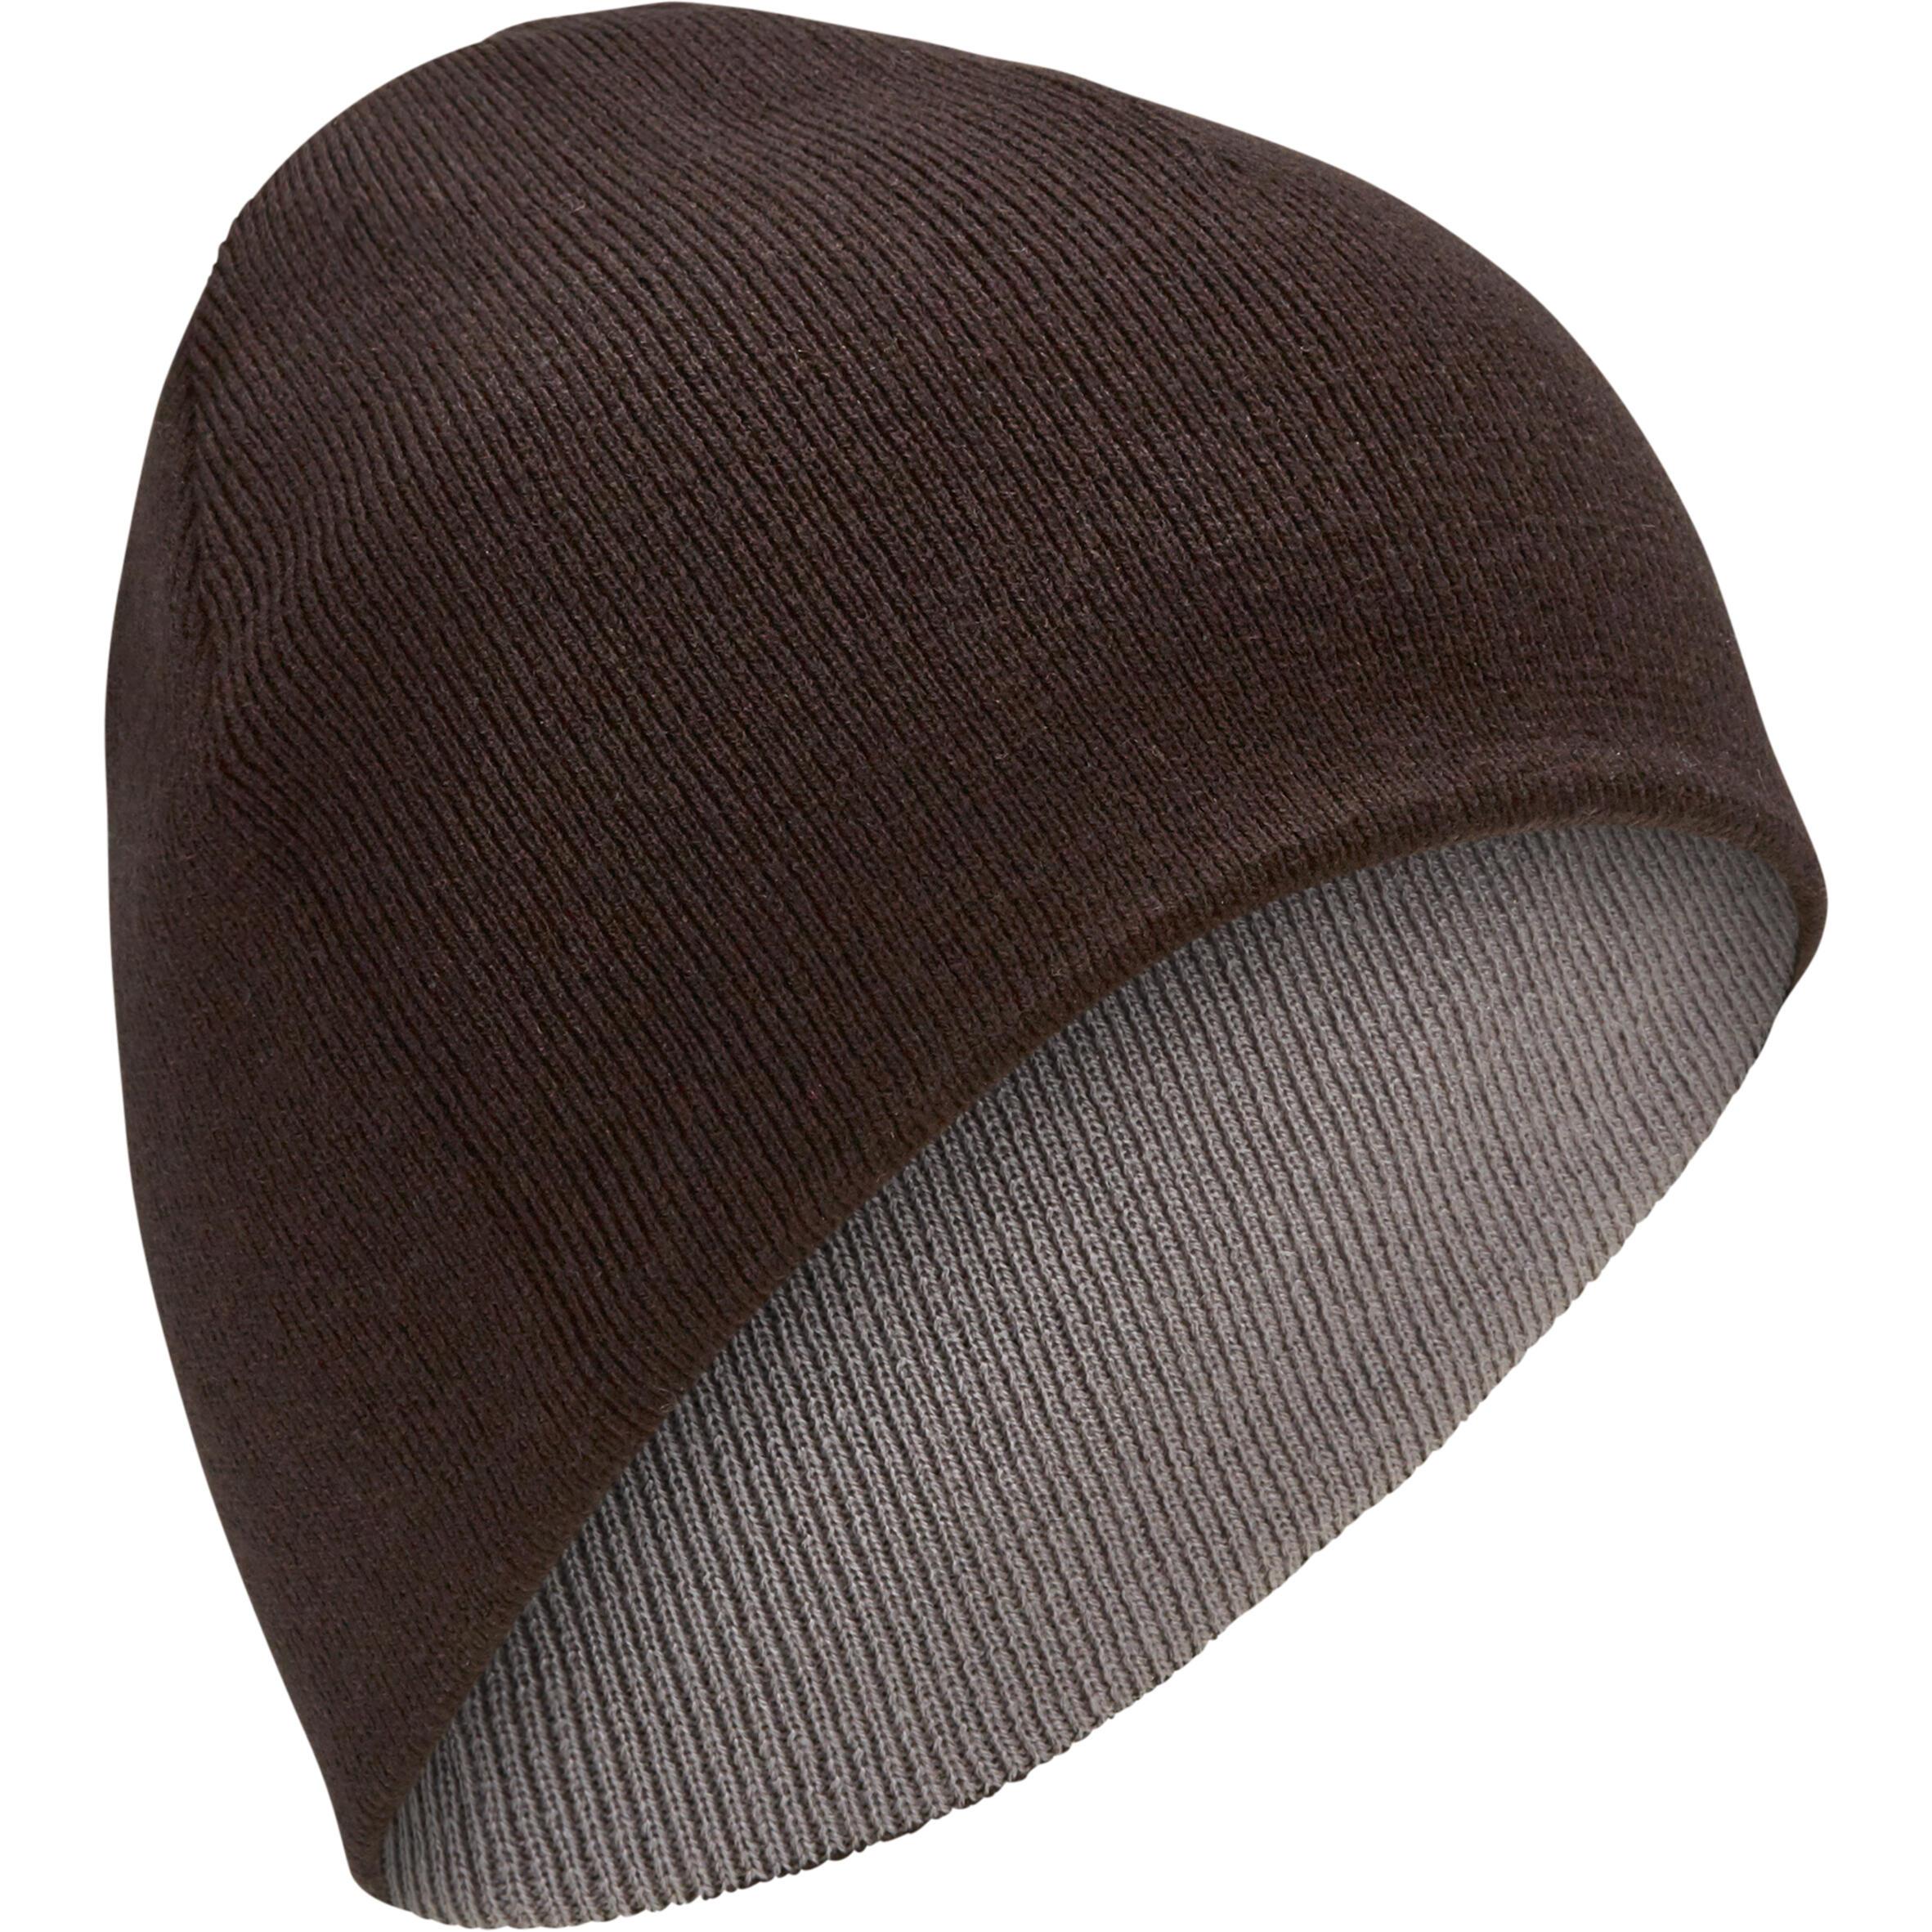 Damen,Herren Skimütze wendbar Erwachsene schwarz grau | 03608449880725